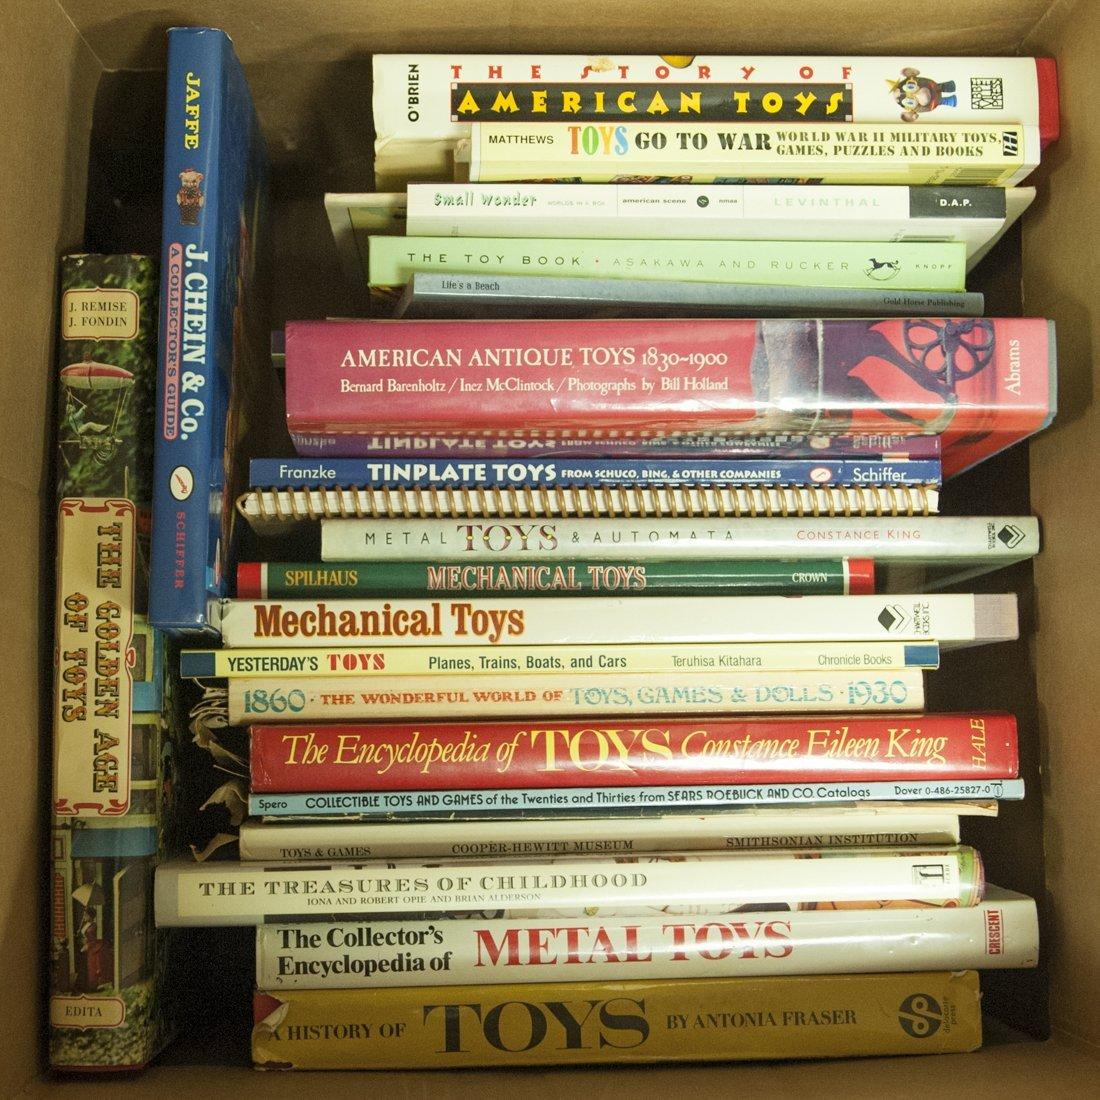 Twenty-five toy-related books.